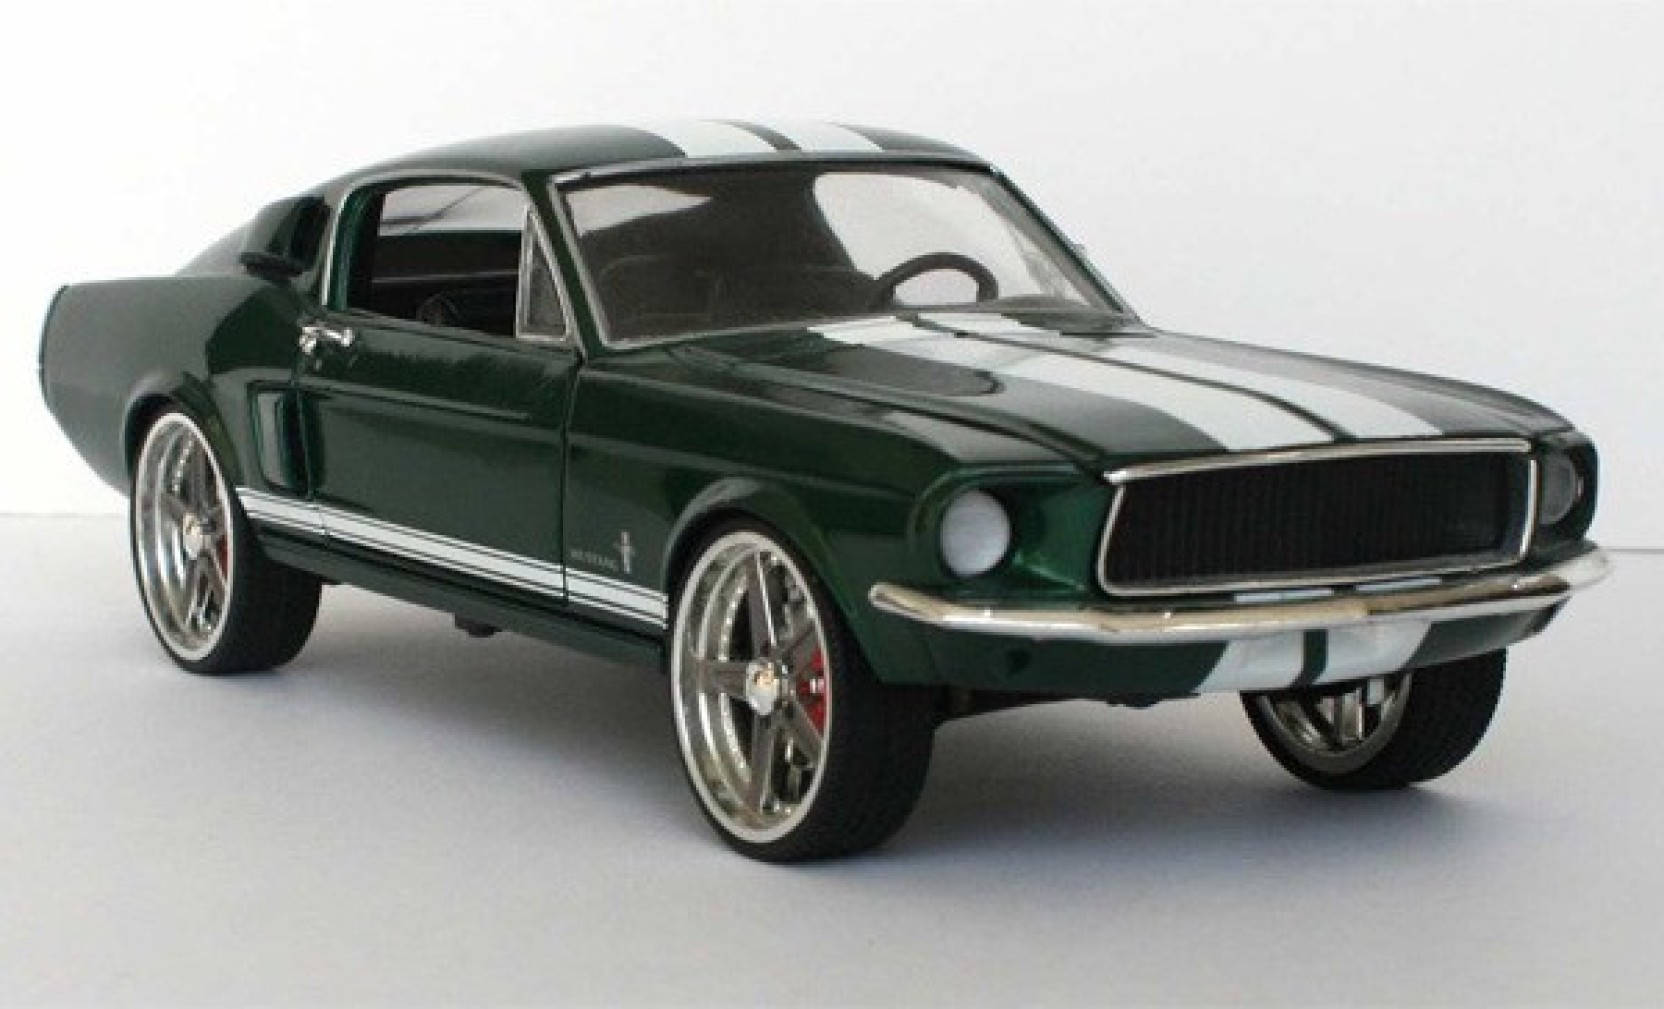 Jada toys fast furious 132 1967 ford mustang 627c green metal die cast multicolor